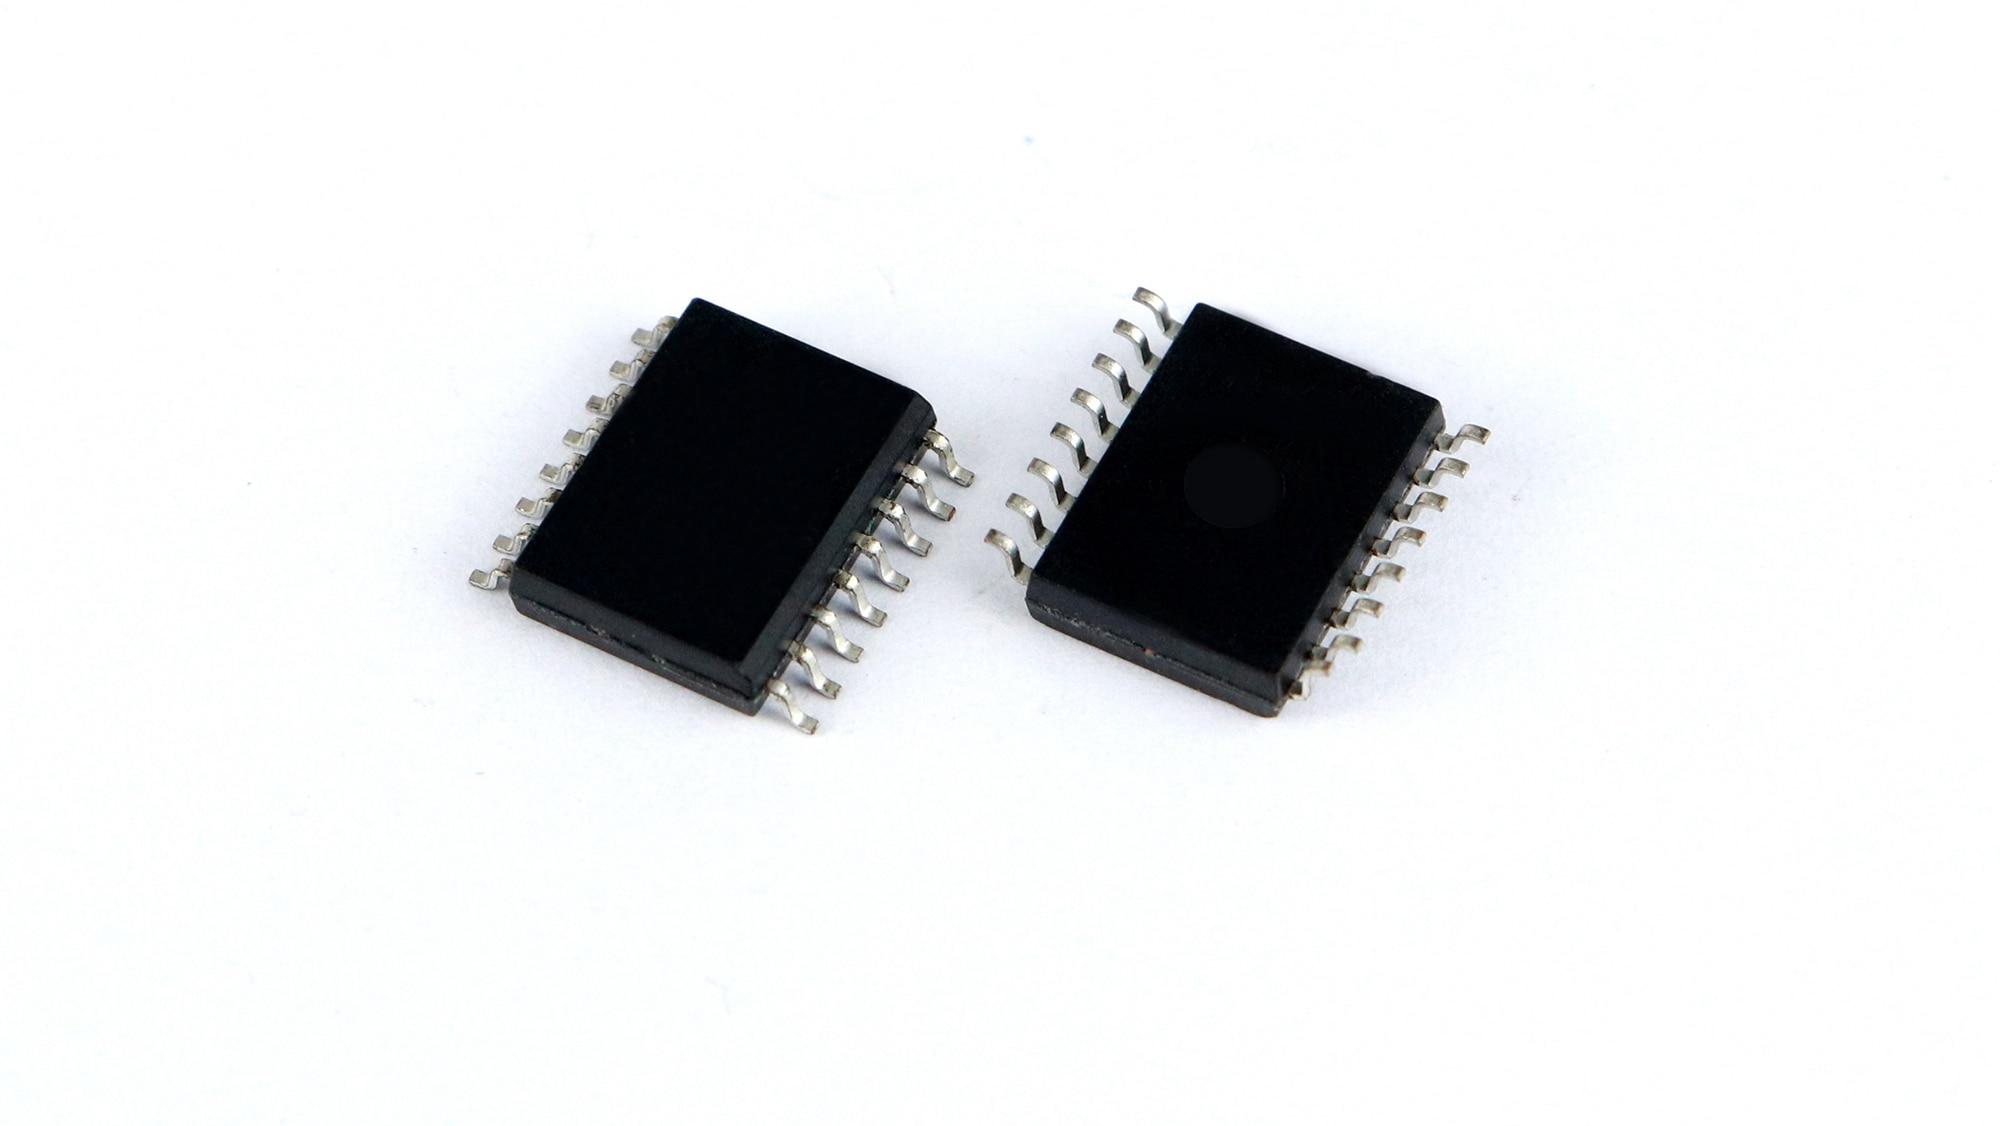 20 unids/lote BA6845FS-E2 SSOP-16 BA6845FS 6845FS